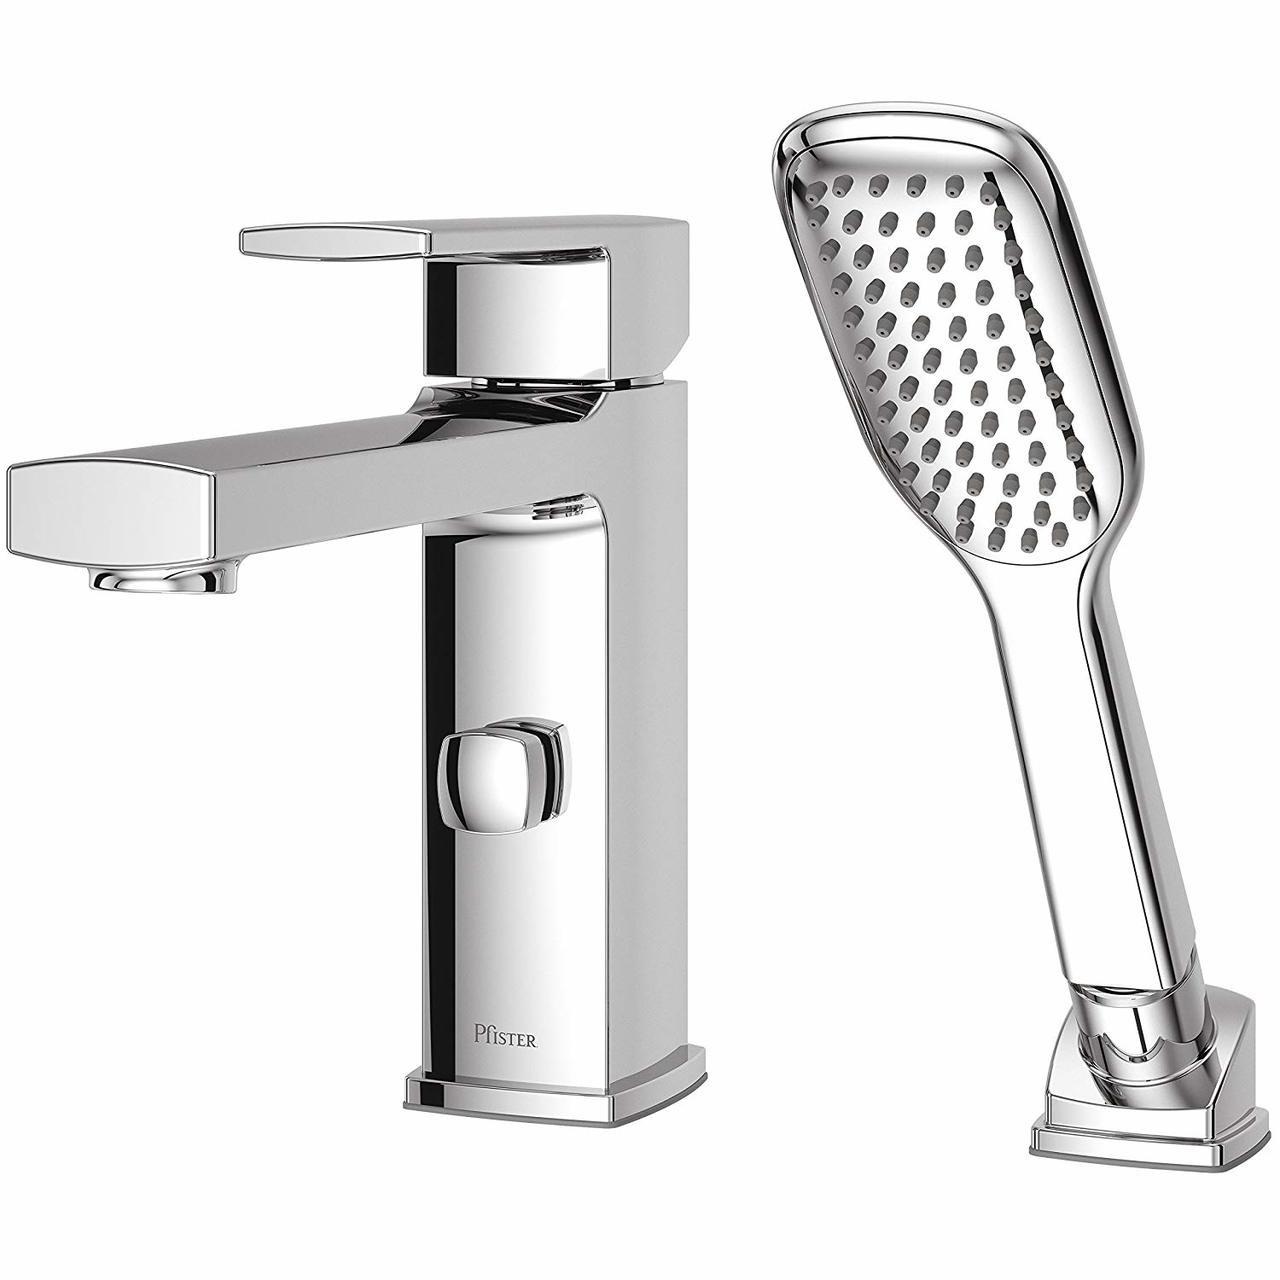 Pfister Rt6 2dac Deckard Single Handle Roman Tub Faucet Trim With Handshower Chrome